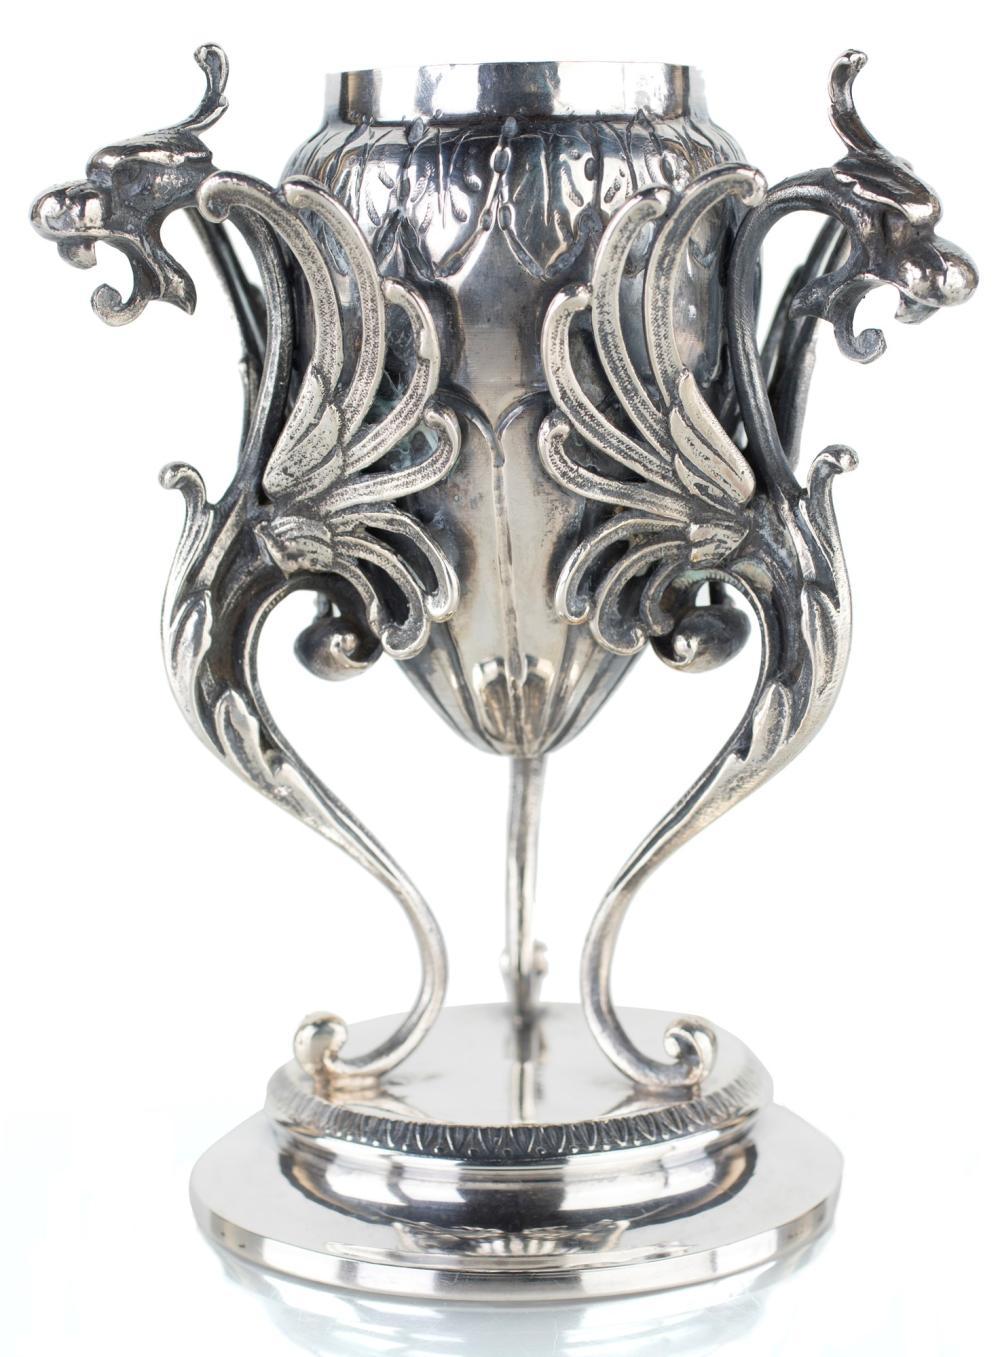 SILVER PERFUME JAR, LATE 19TH CENTURY